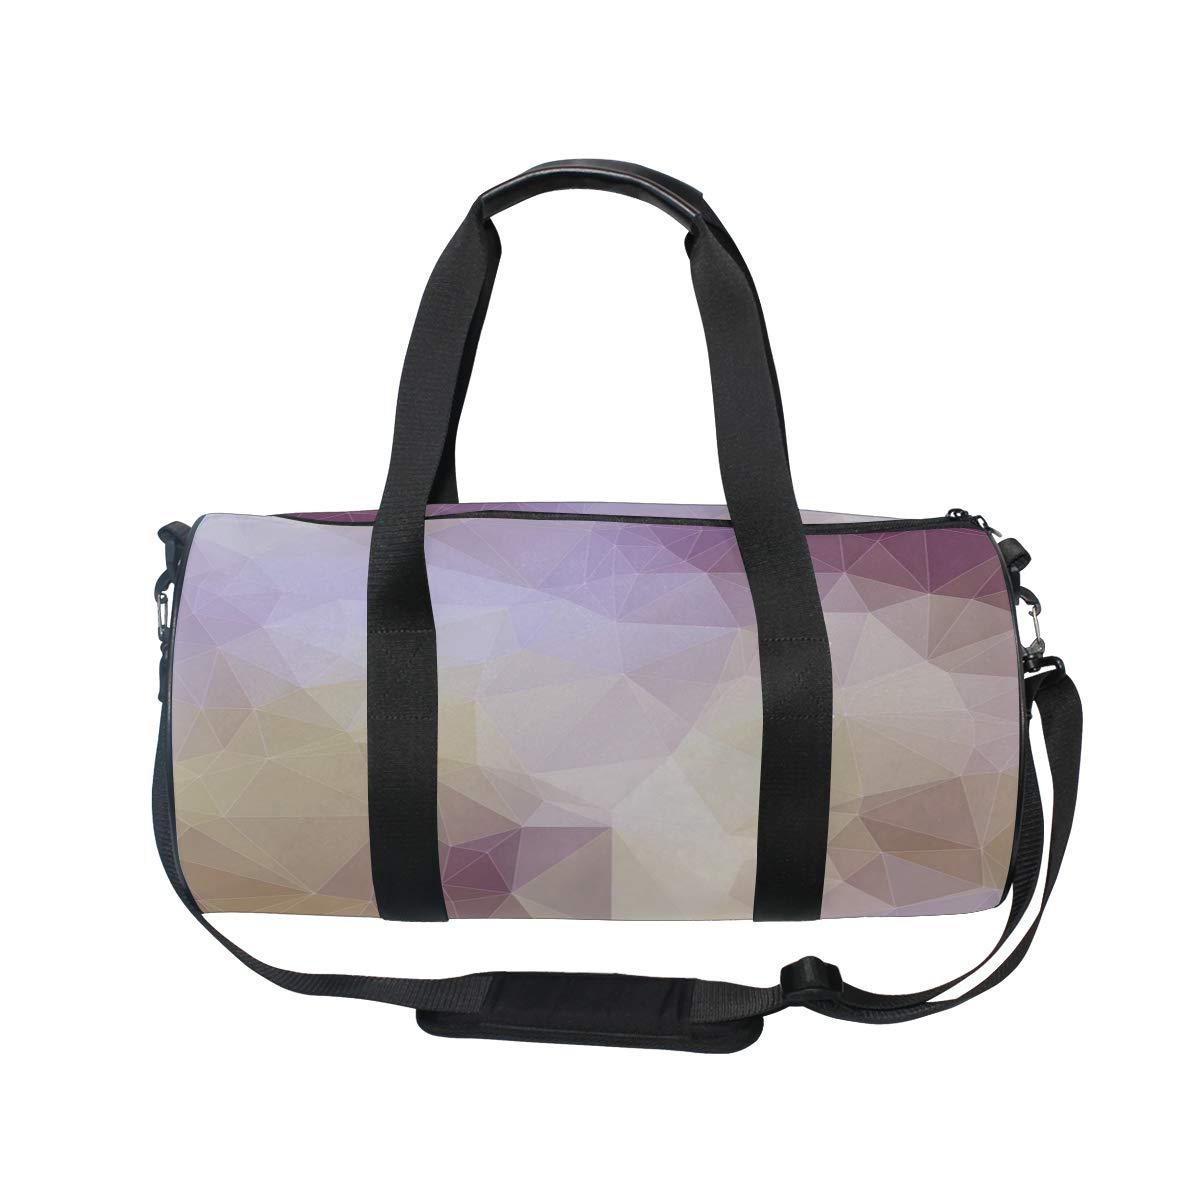 Psychedelic Ceramic PictureWaterproof Non-Slip Wearable Crossbody Bag fitness bag Shoulder Bag